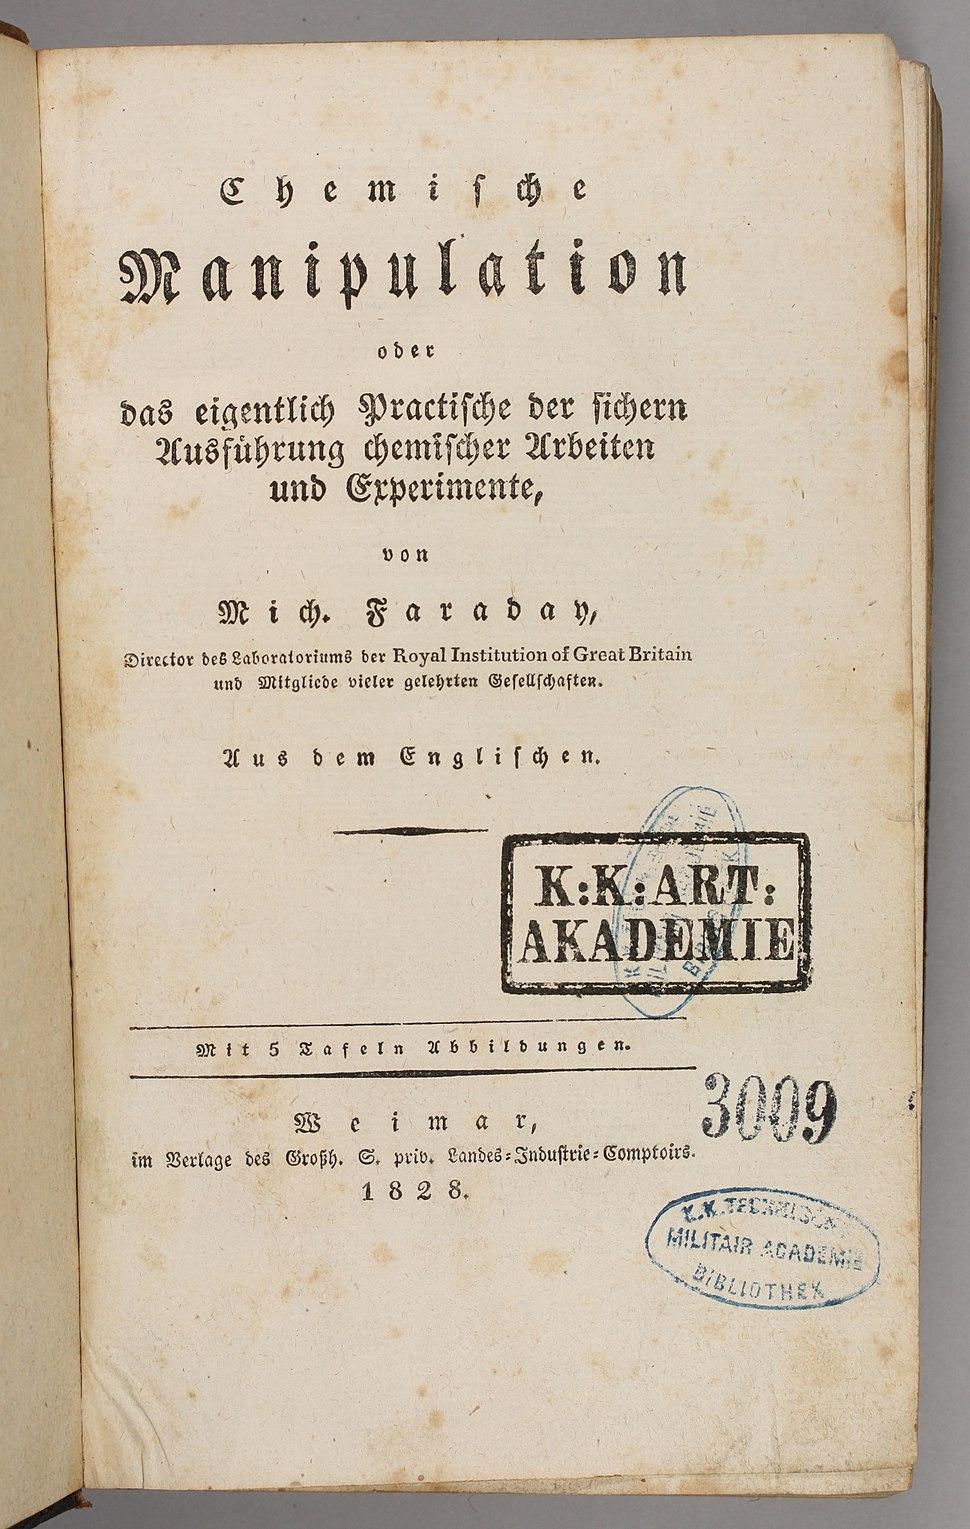 Michael Faraday 1828 Chemische Manipulation